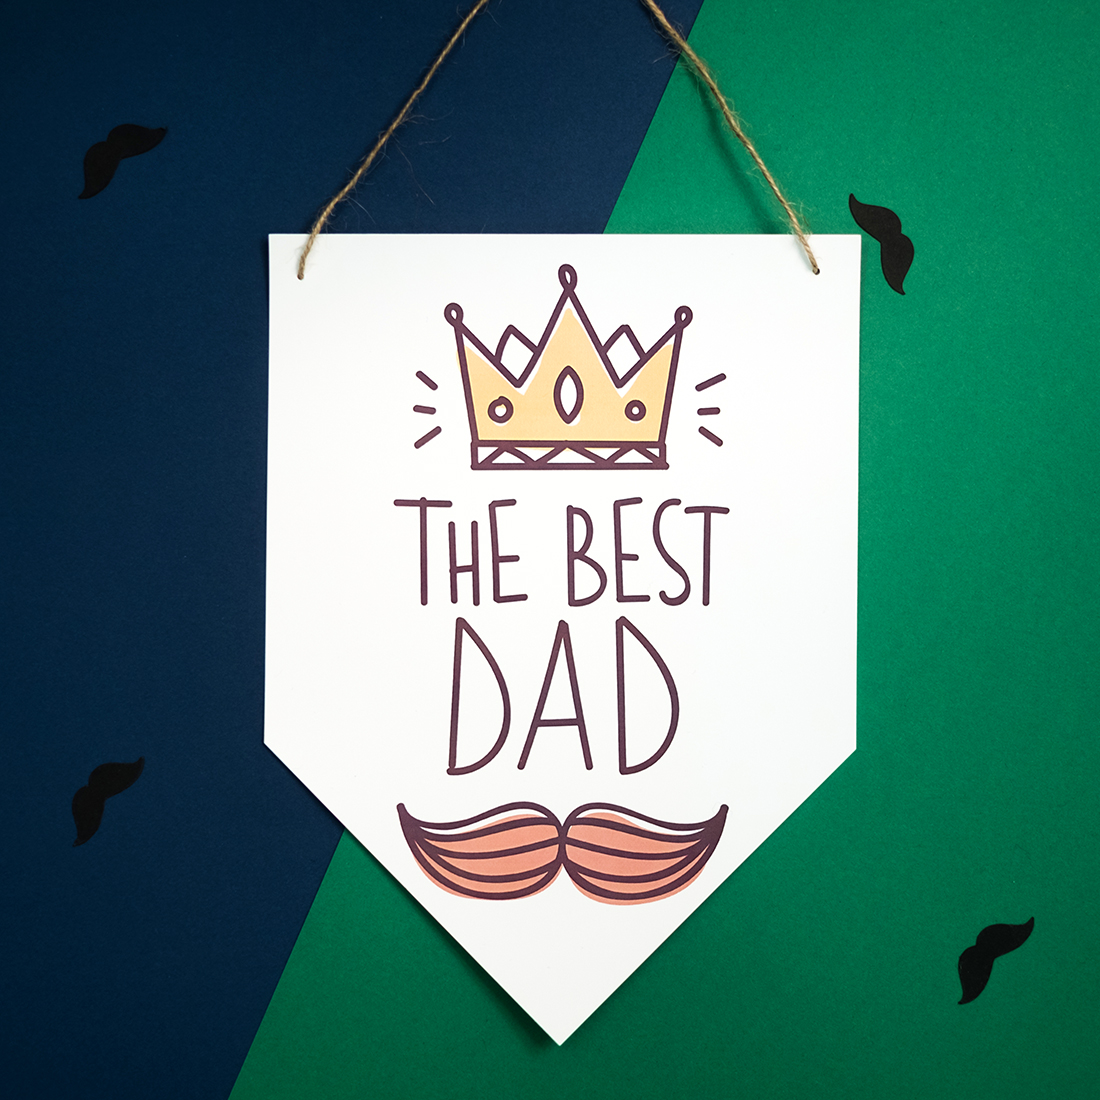 Bandeira DIA DO PAI - THE BEST DAD